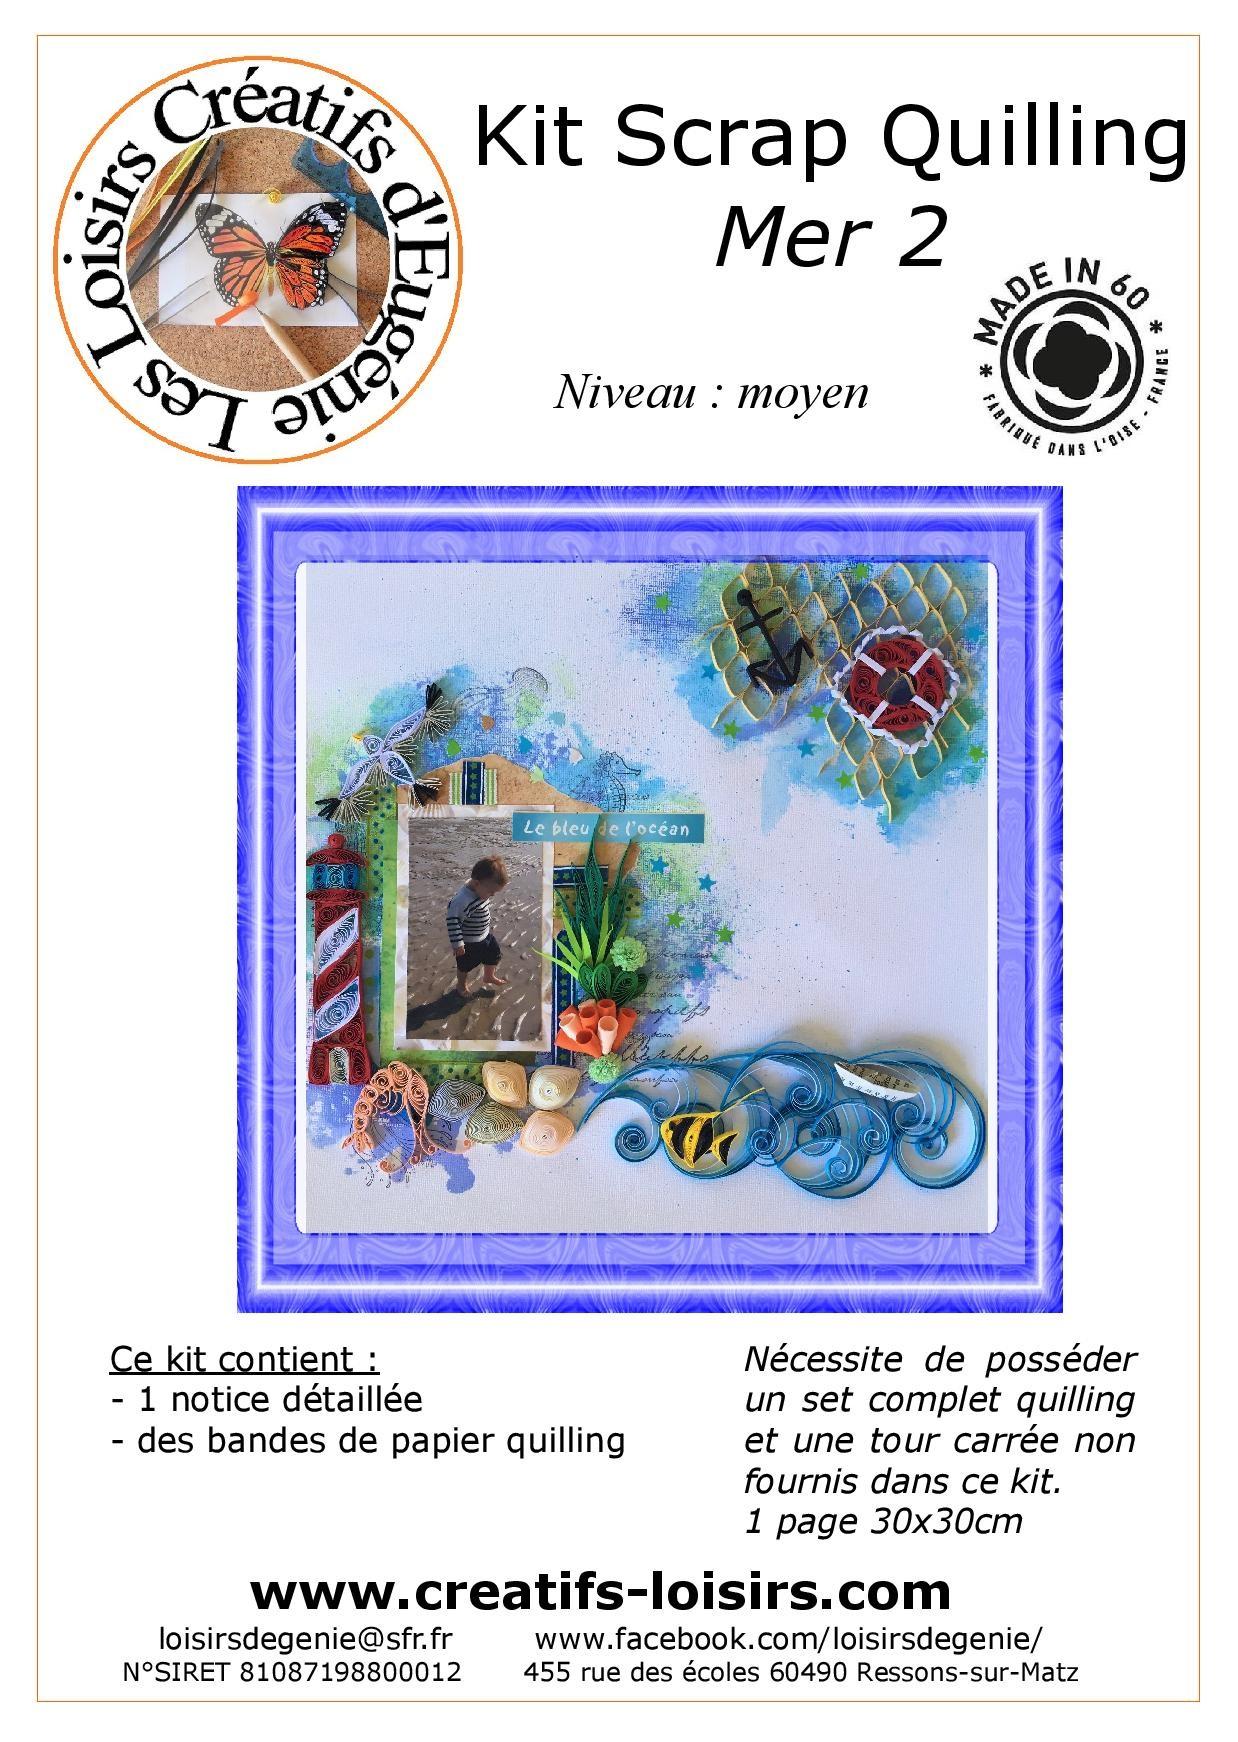 Flyer kit scrapbooking quilling mer loisir creatif